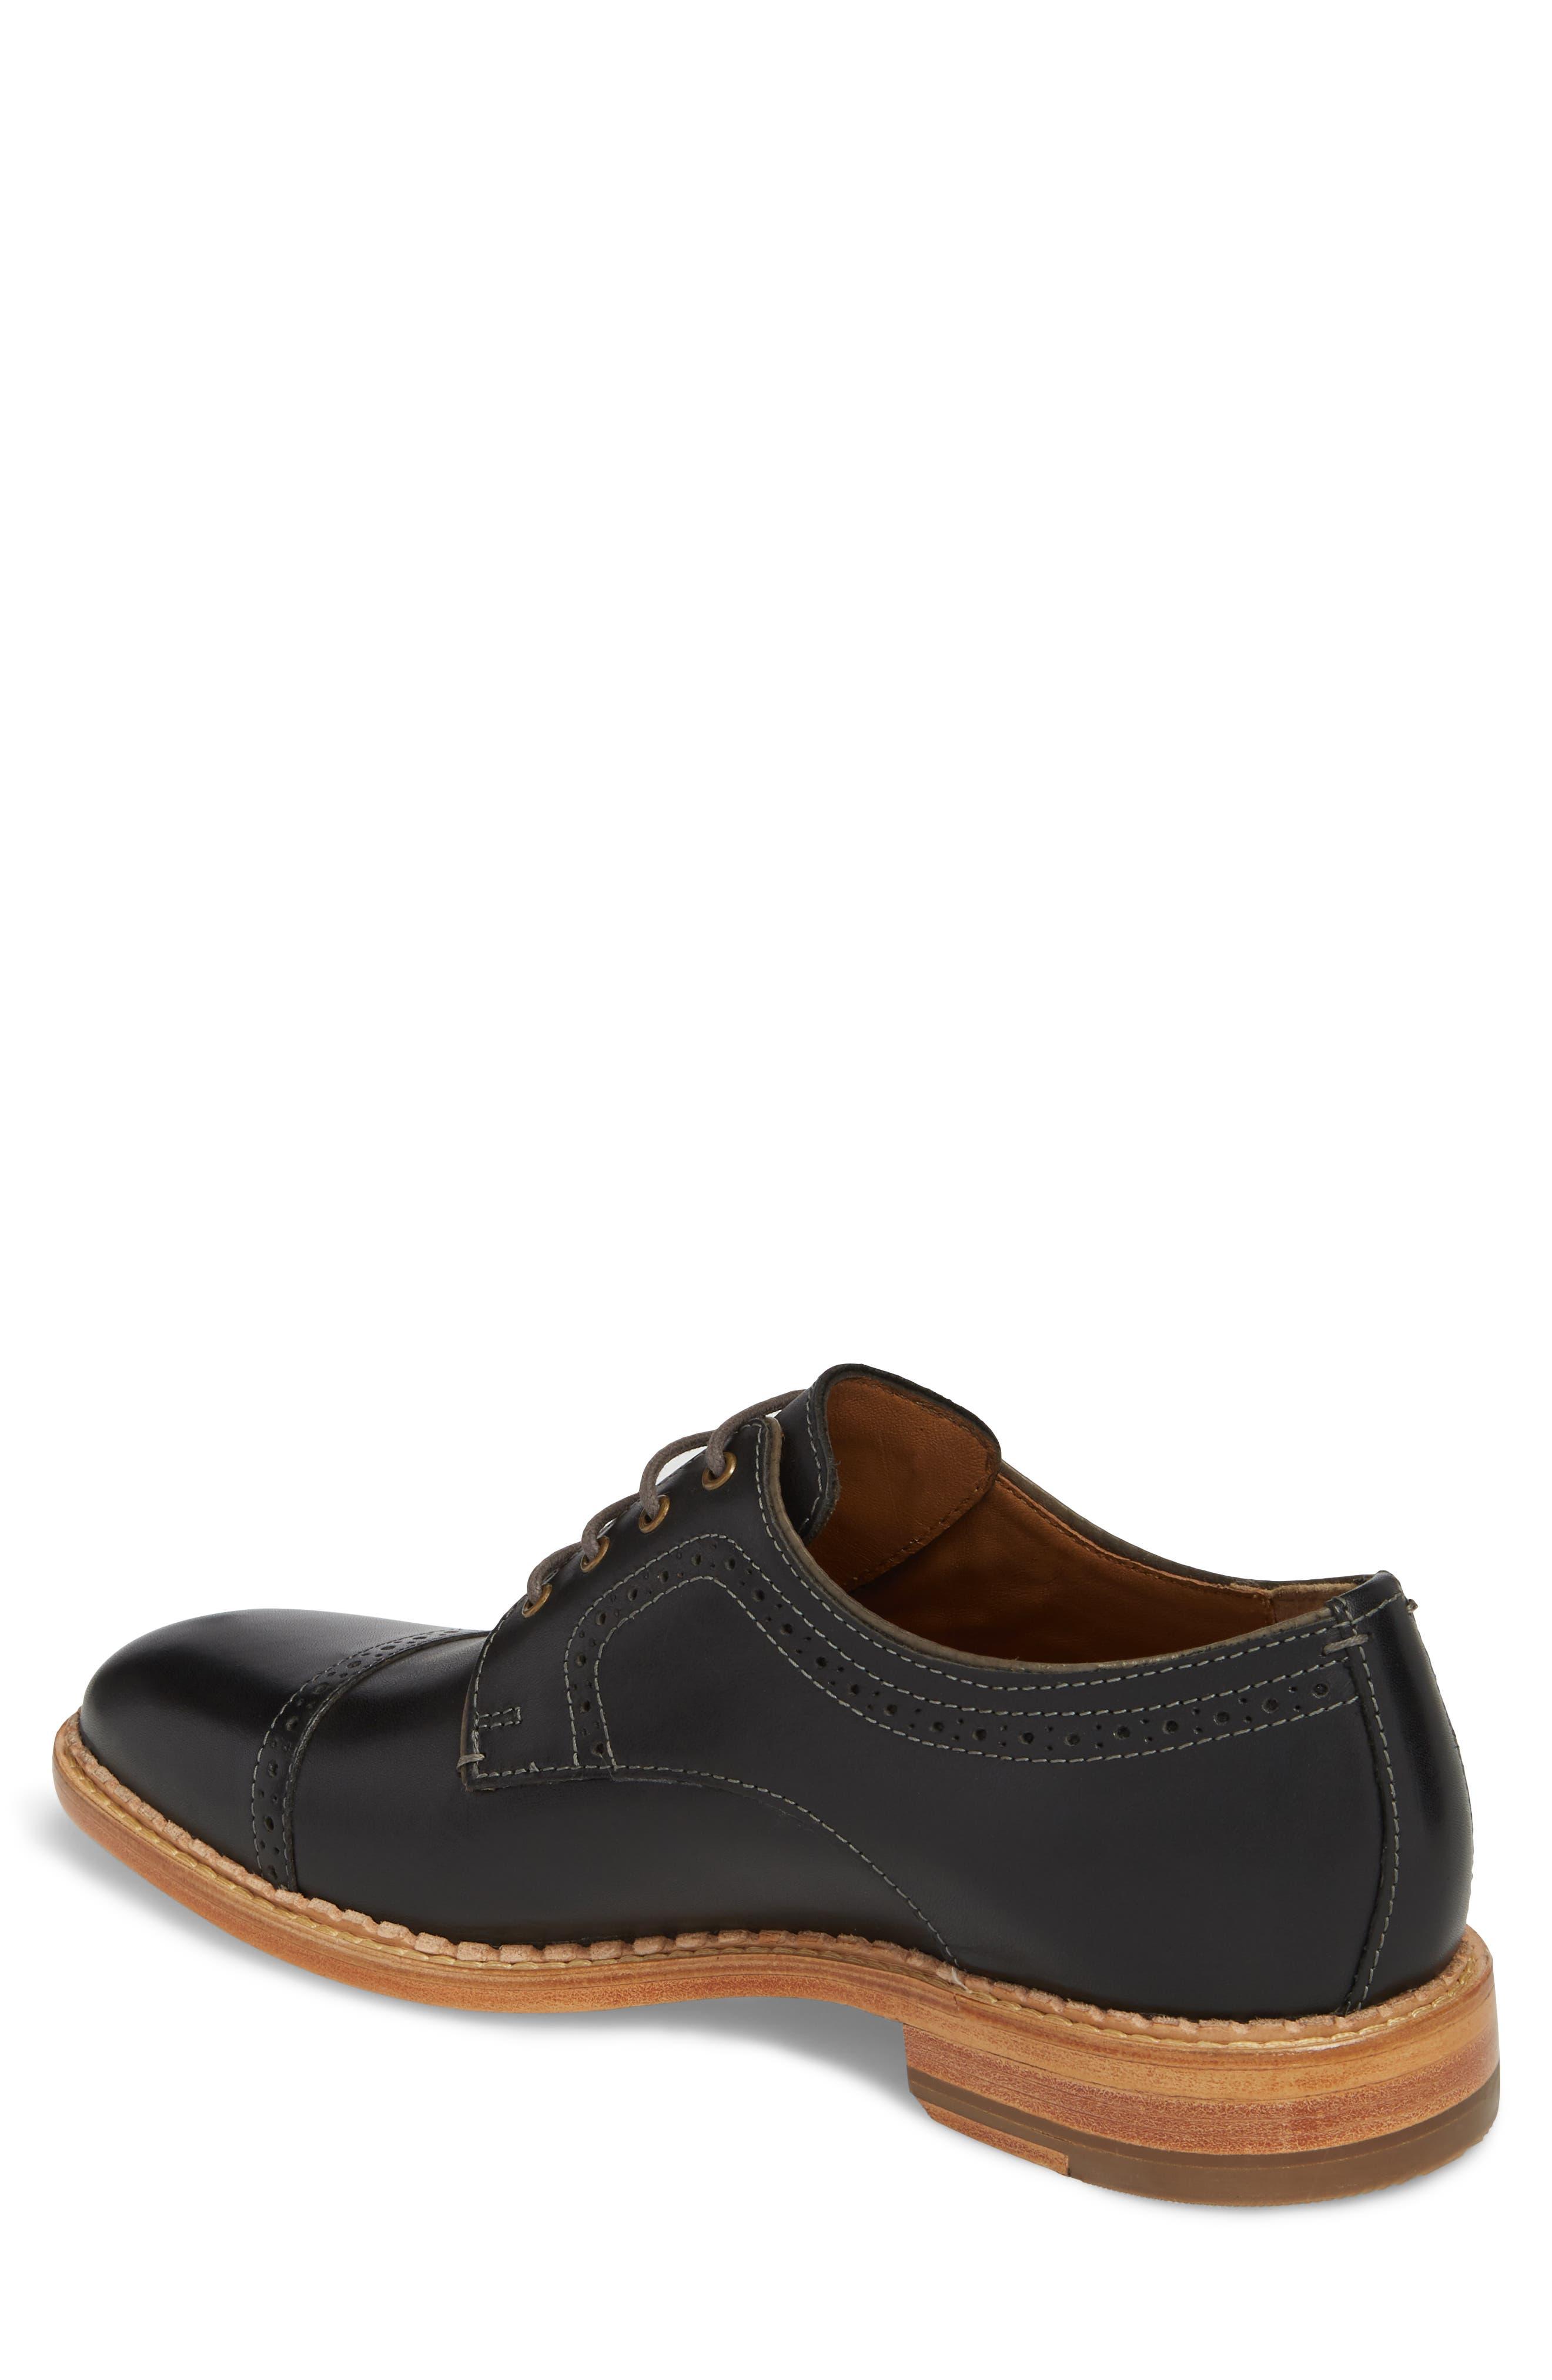 Chambliss Cap Toe Derby,                             Alternate thumbnail 2, color,                             Black Leather